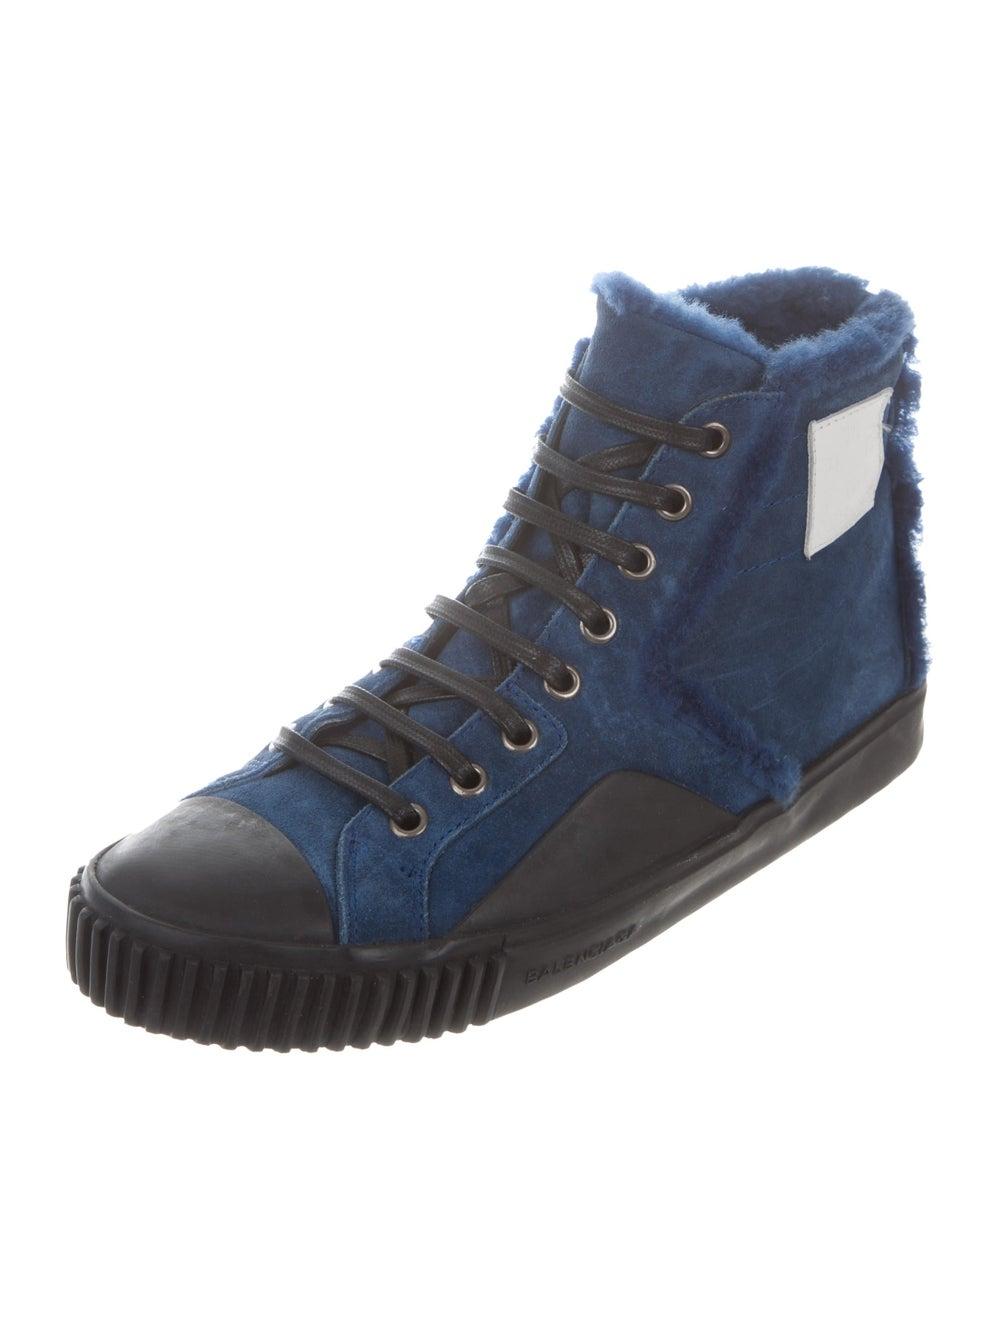 Balenciaga Cap-Toe Shearling-Trimmed Sneakers bla… - image 2